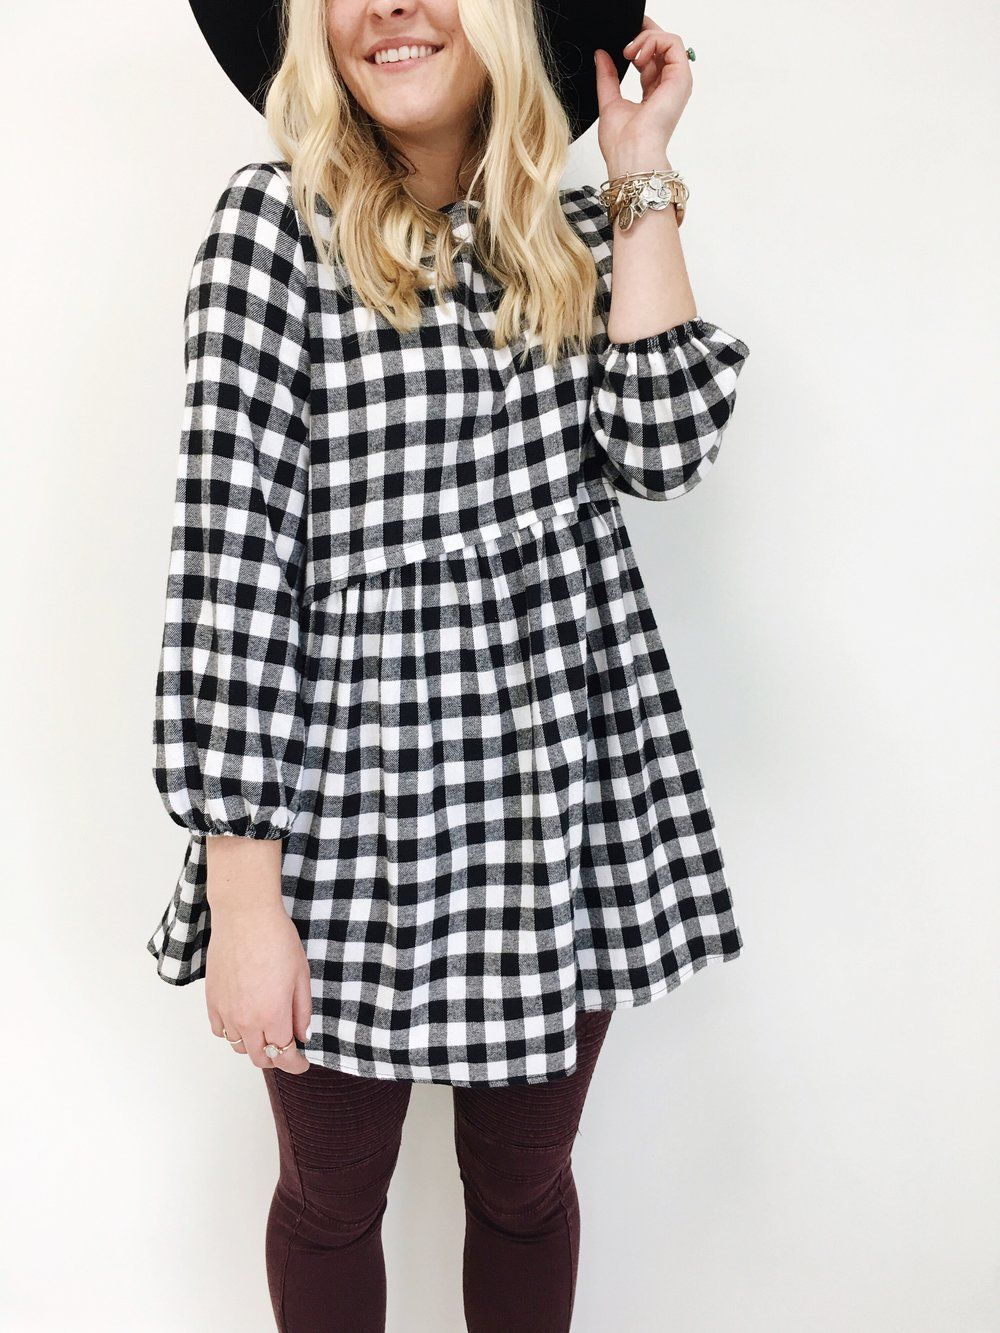 Black White Checkered Top Babydoll Waist Long Sleeve W